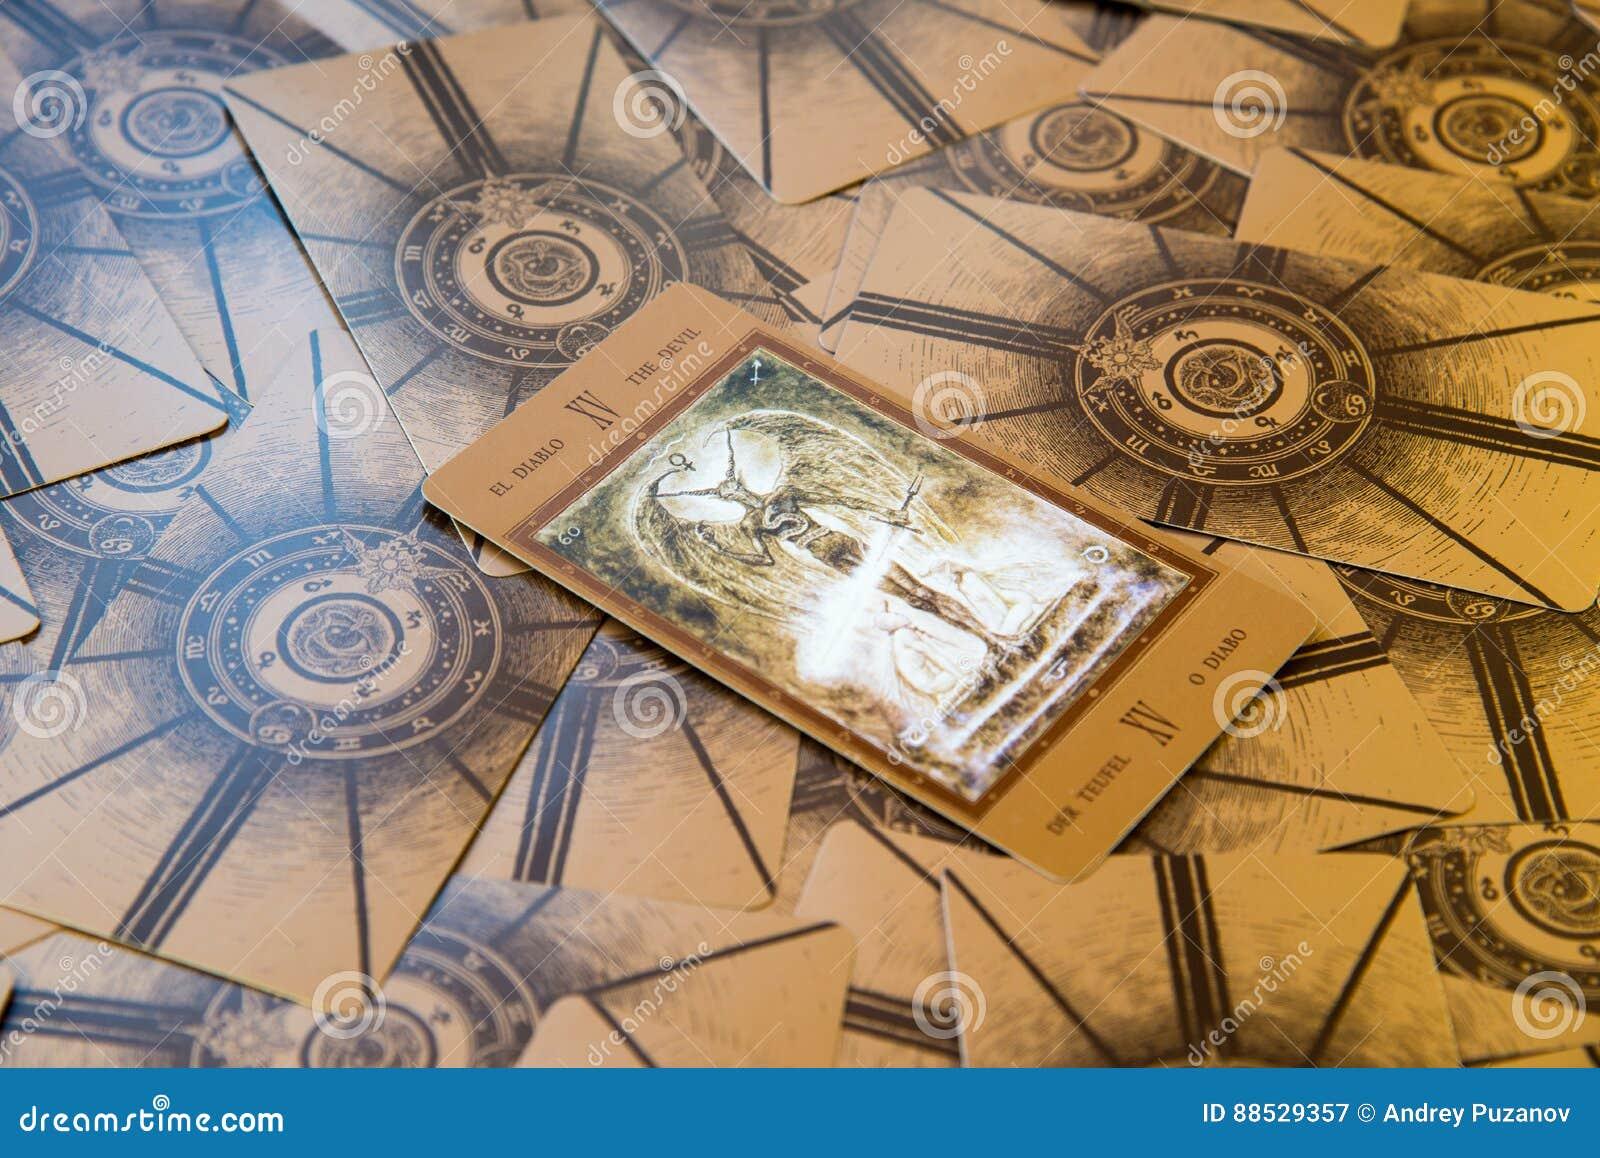 Tarot Card The Devil  Labirinth Tarot Deck  Esoteric